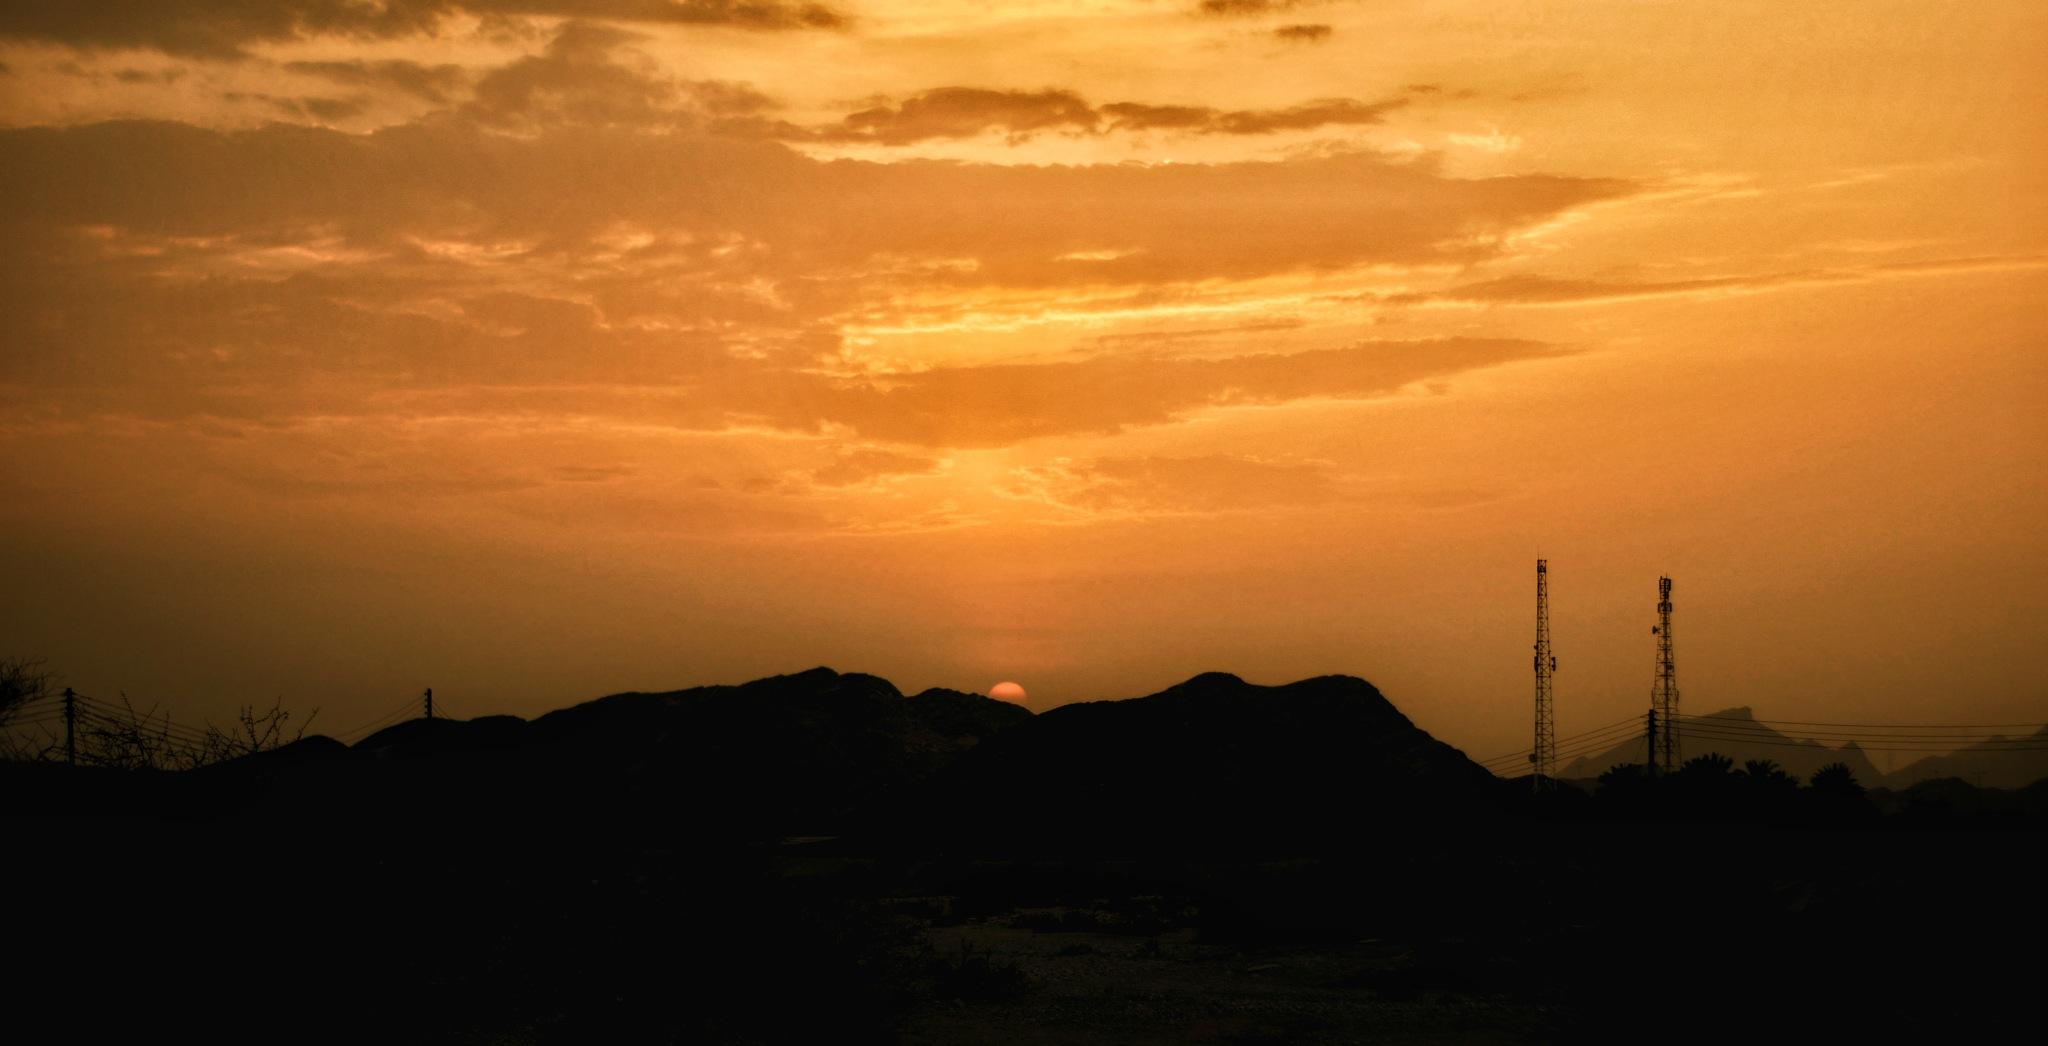 sunset  by Roshin Mariyakutty Varghese